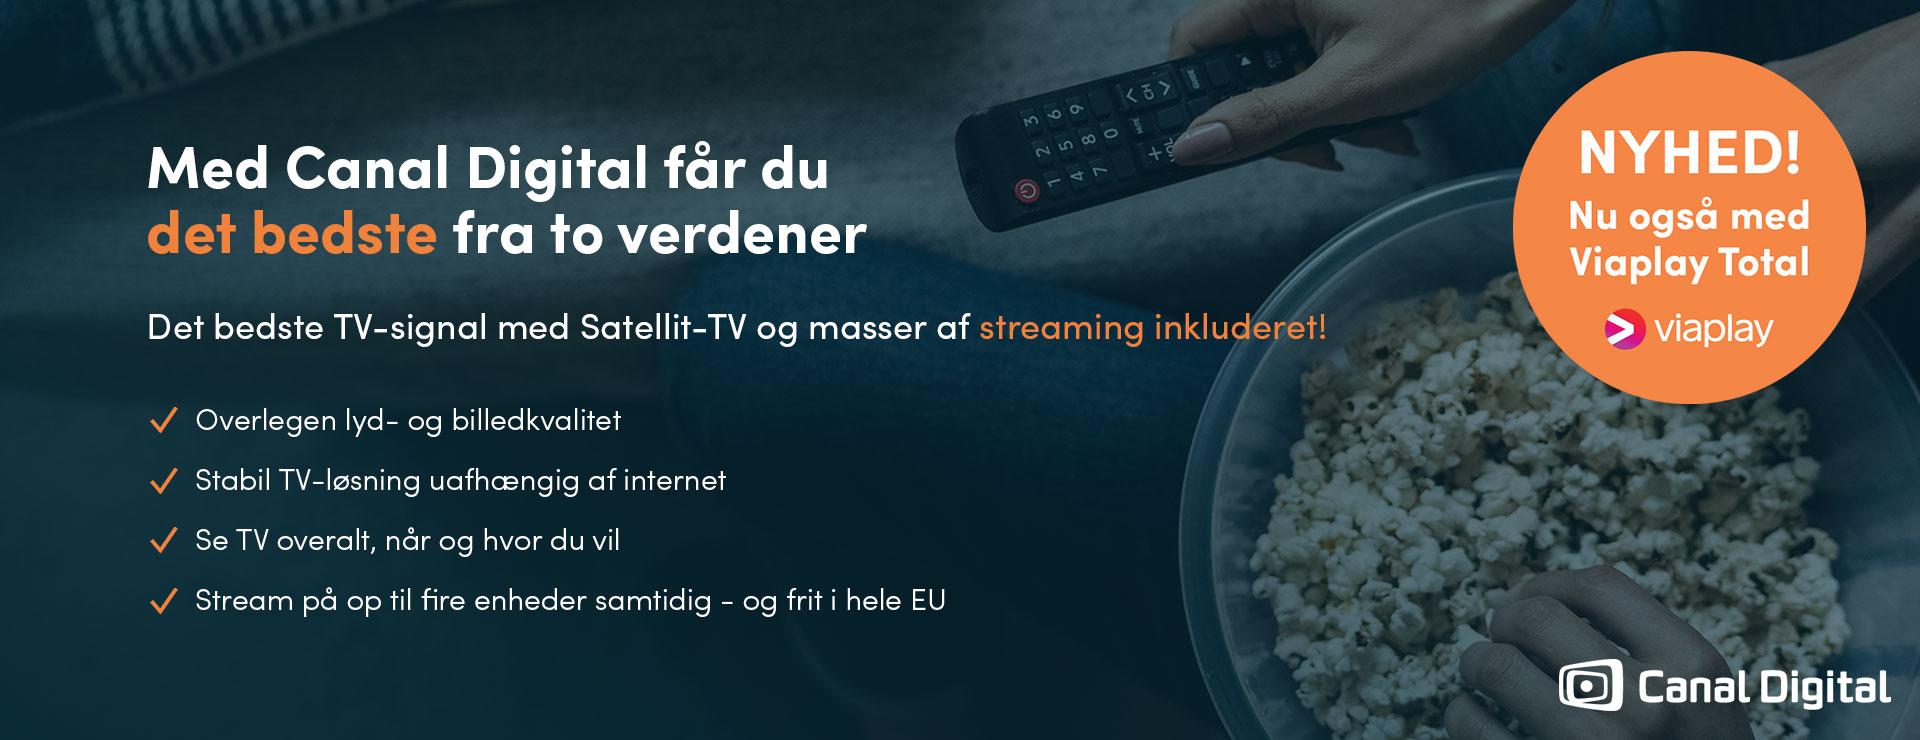 Canal Digital tilbud